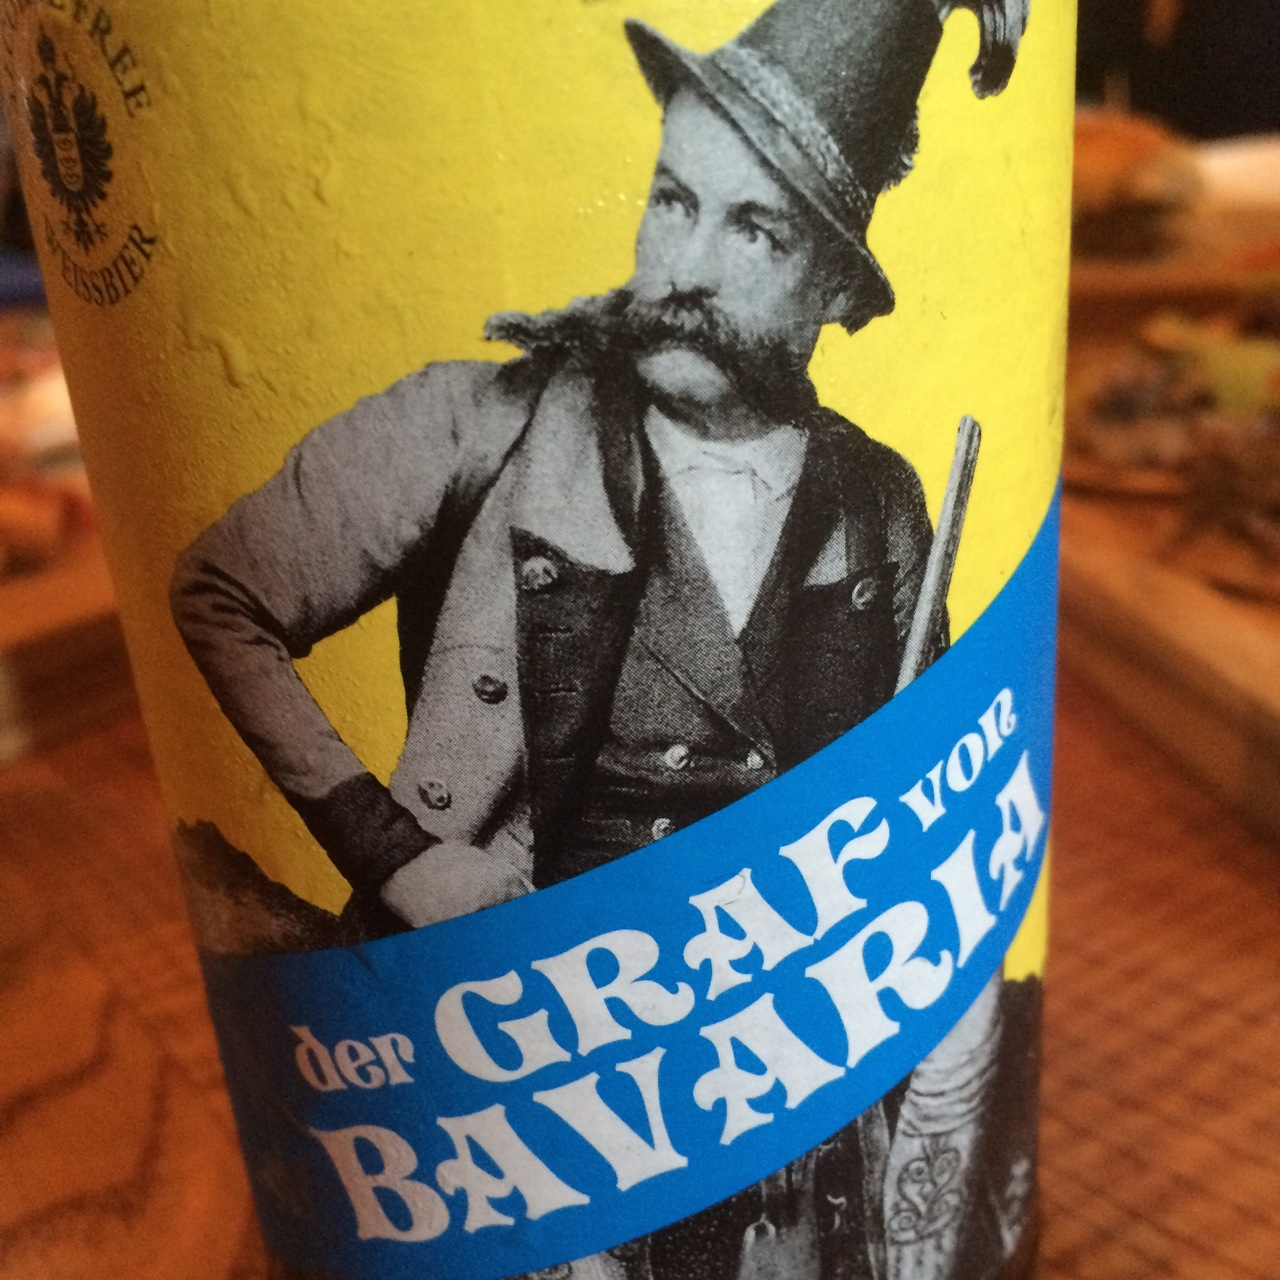 https://i1.wp.com/fatgayvegan.com/wp-content/uploads/2015/07/alcohol-free-beer-and-union.jpg?fit=1280%2C1280